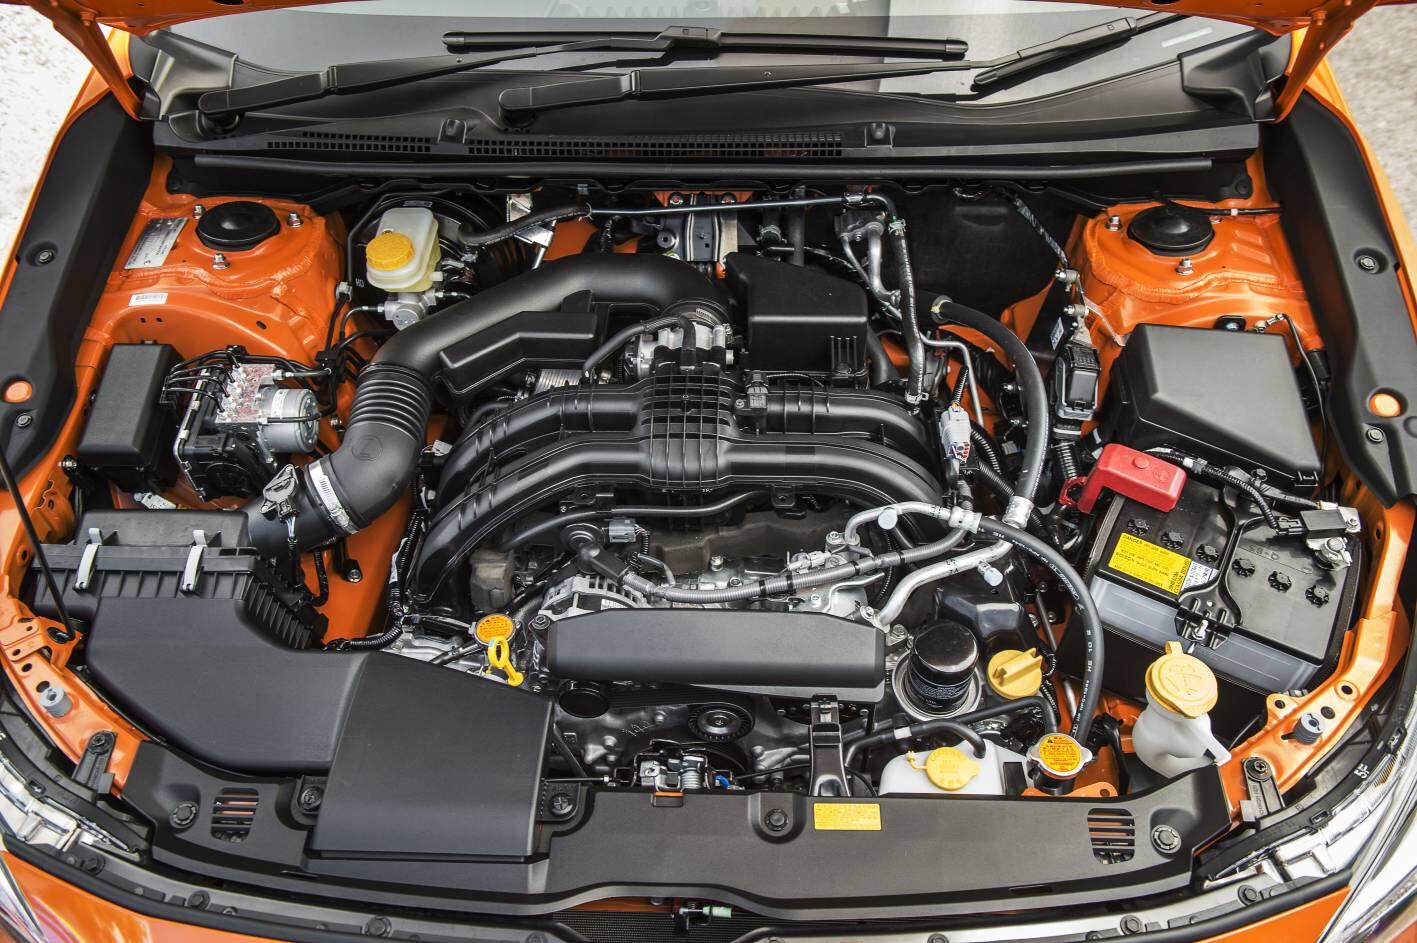 Subaru XV 2.0-litre engine